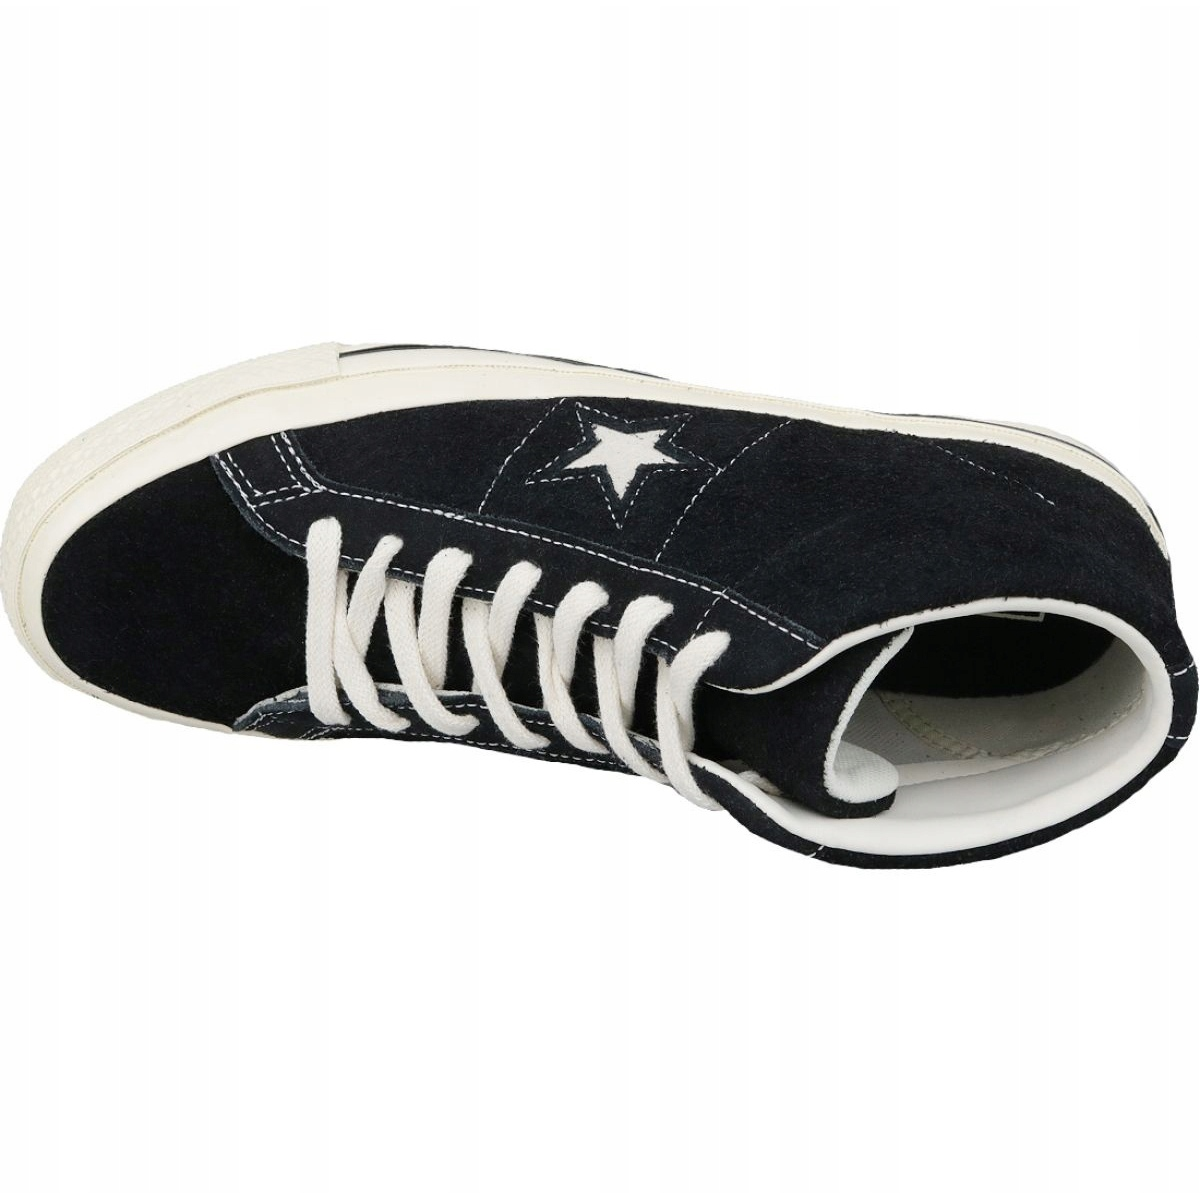 Details about Converse One Star Ox Mid Vintage Suede M 157701C shoes black